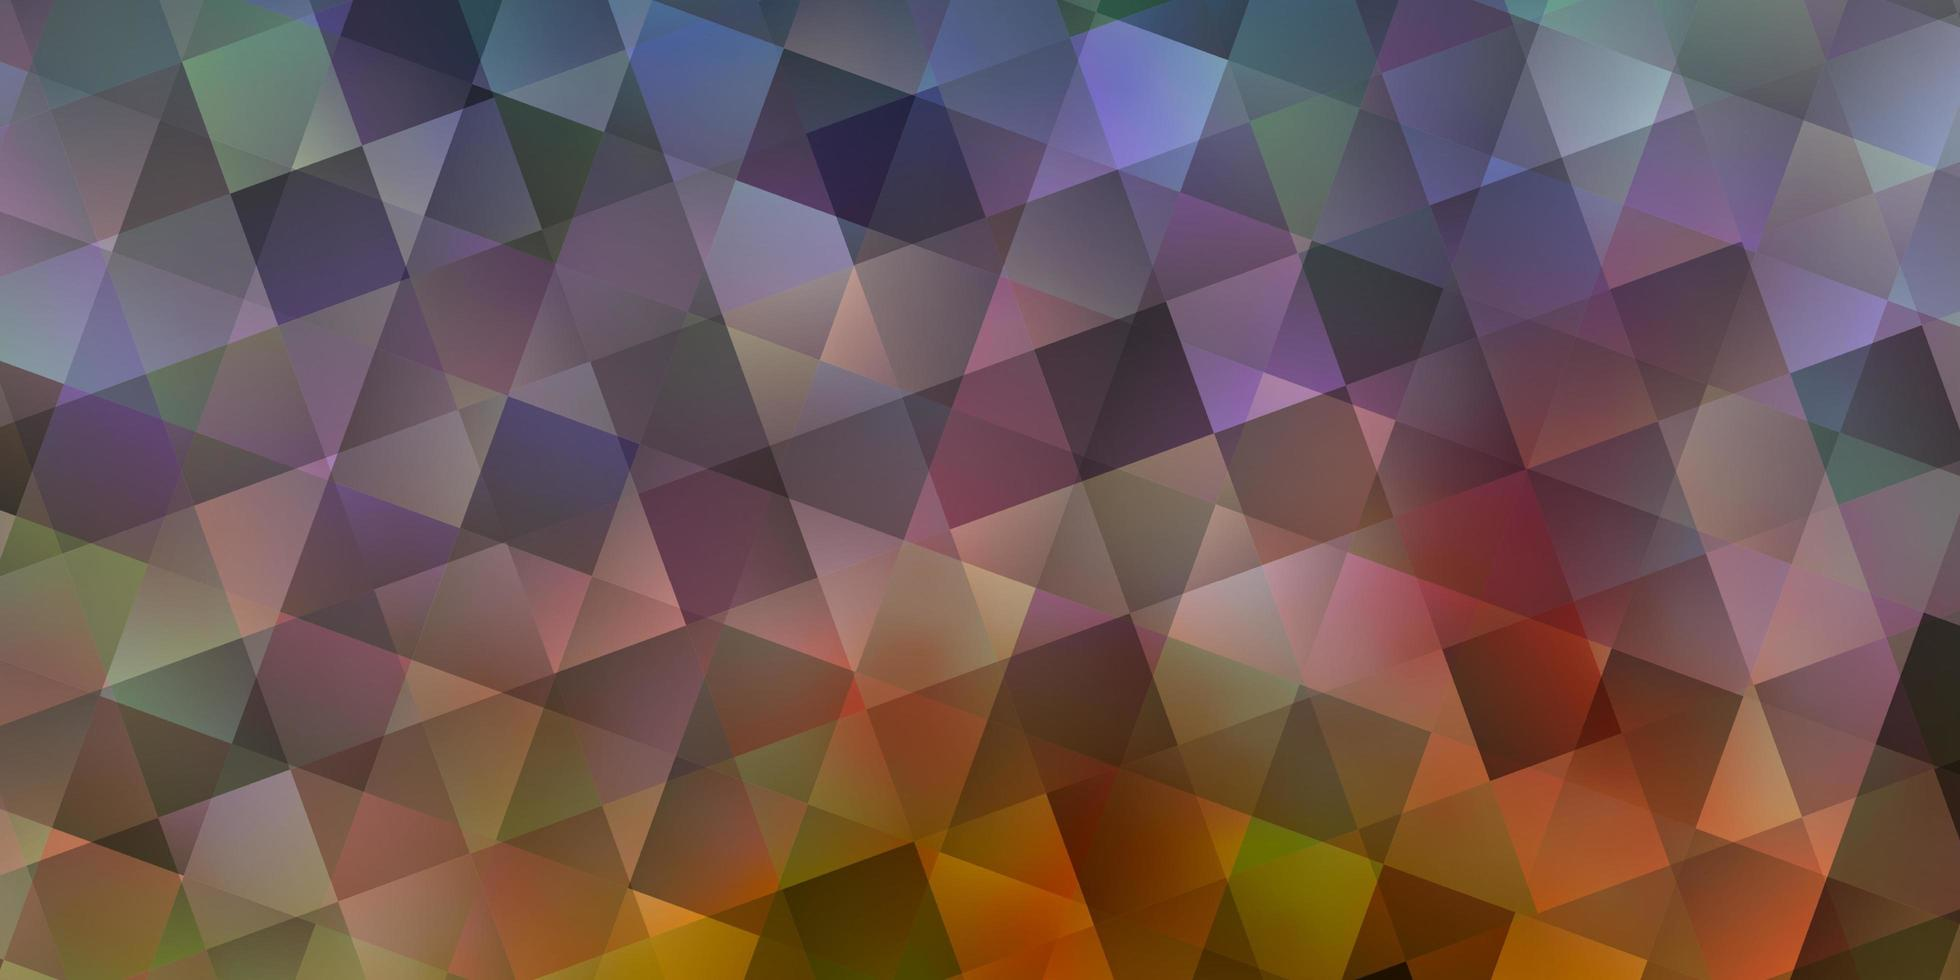 de fundo vector azul e amarelo claro com triângulos, retângulos.